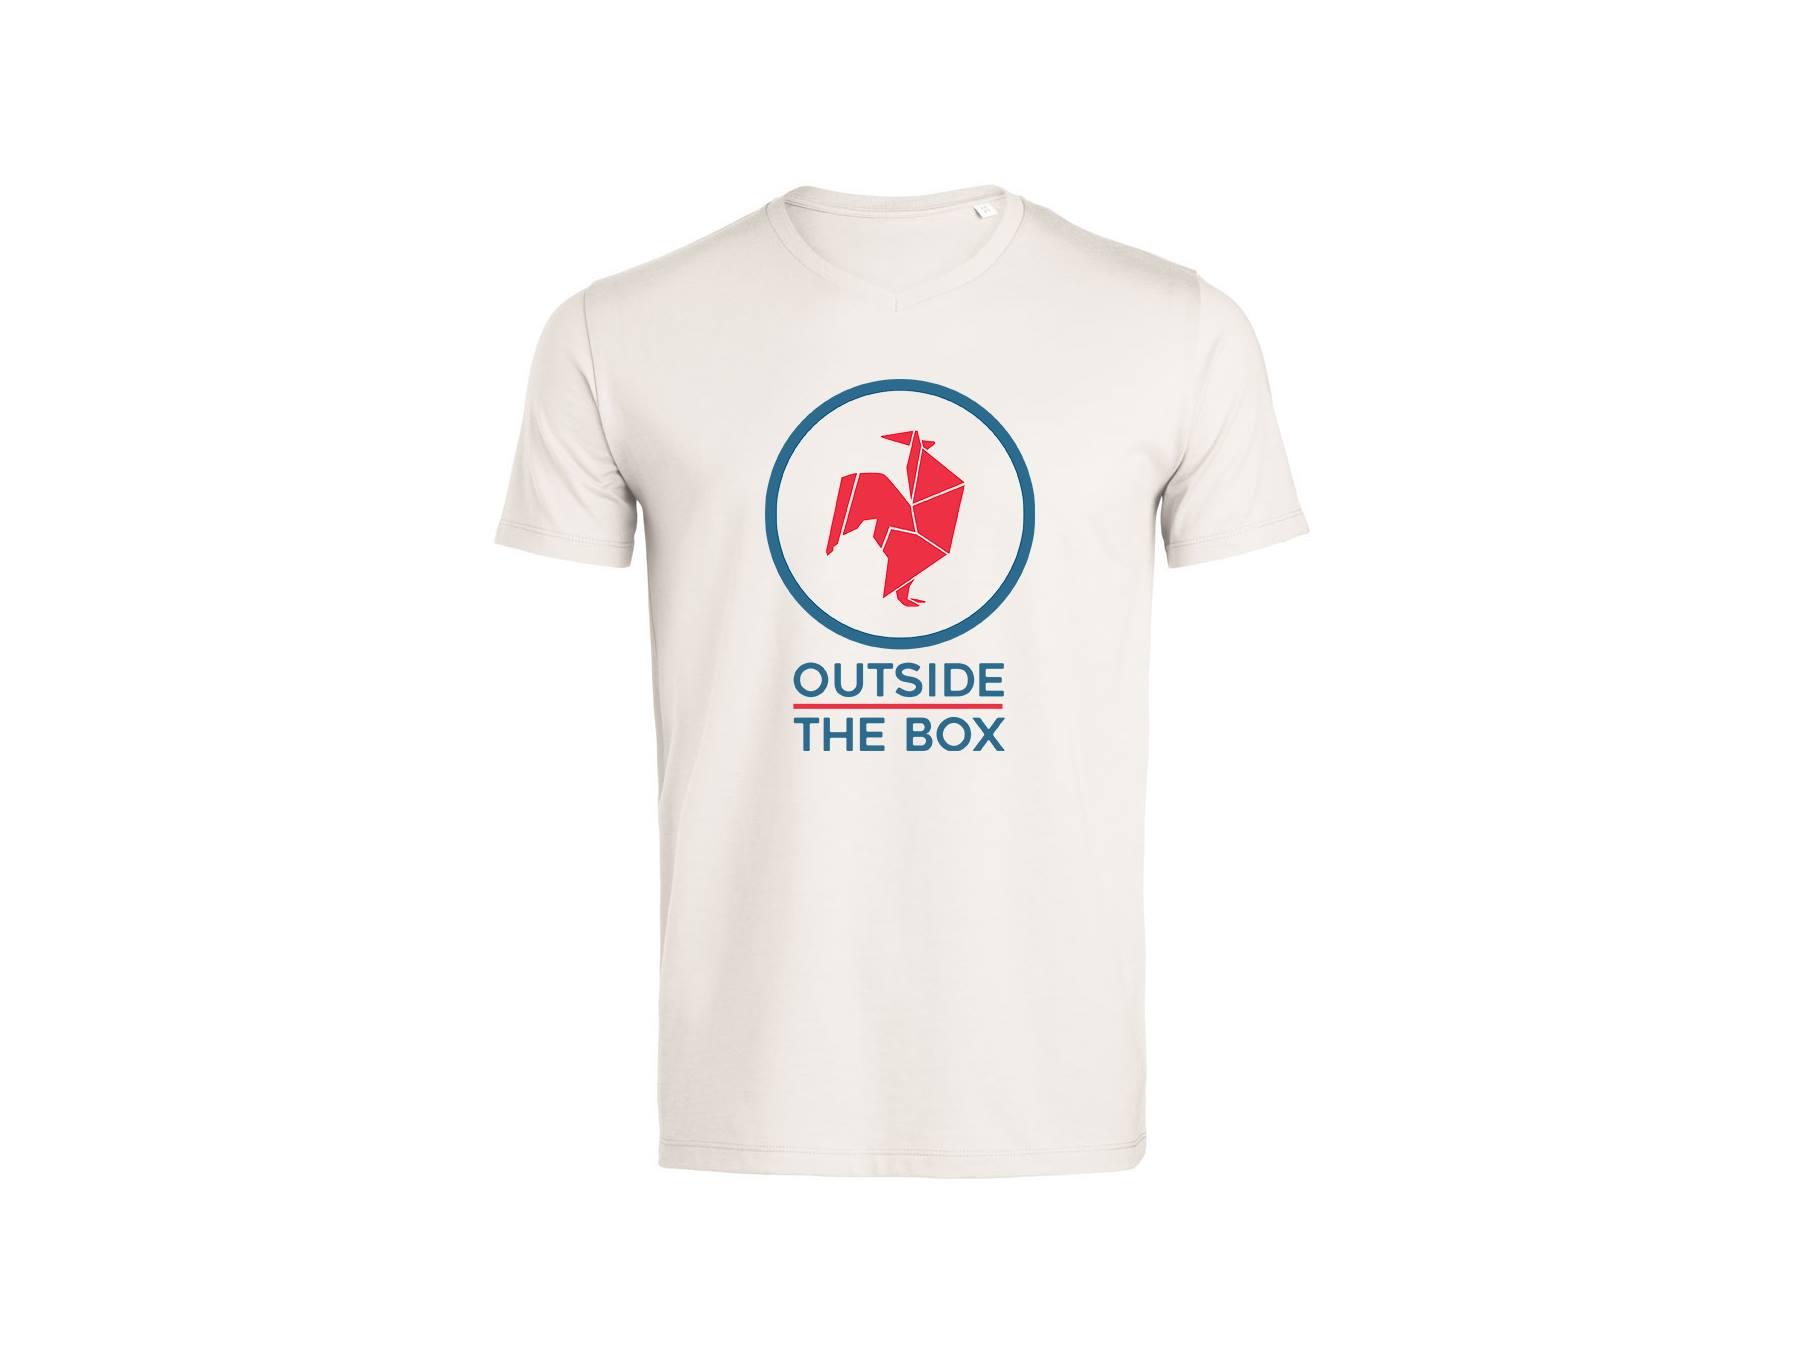 T-shirt_-_Outside_The_BOX-1463752806.jpg